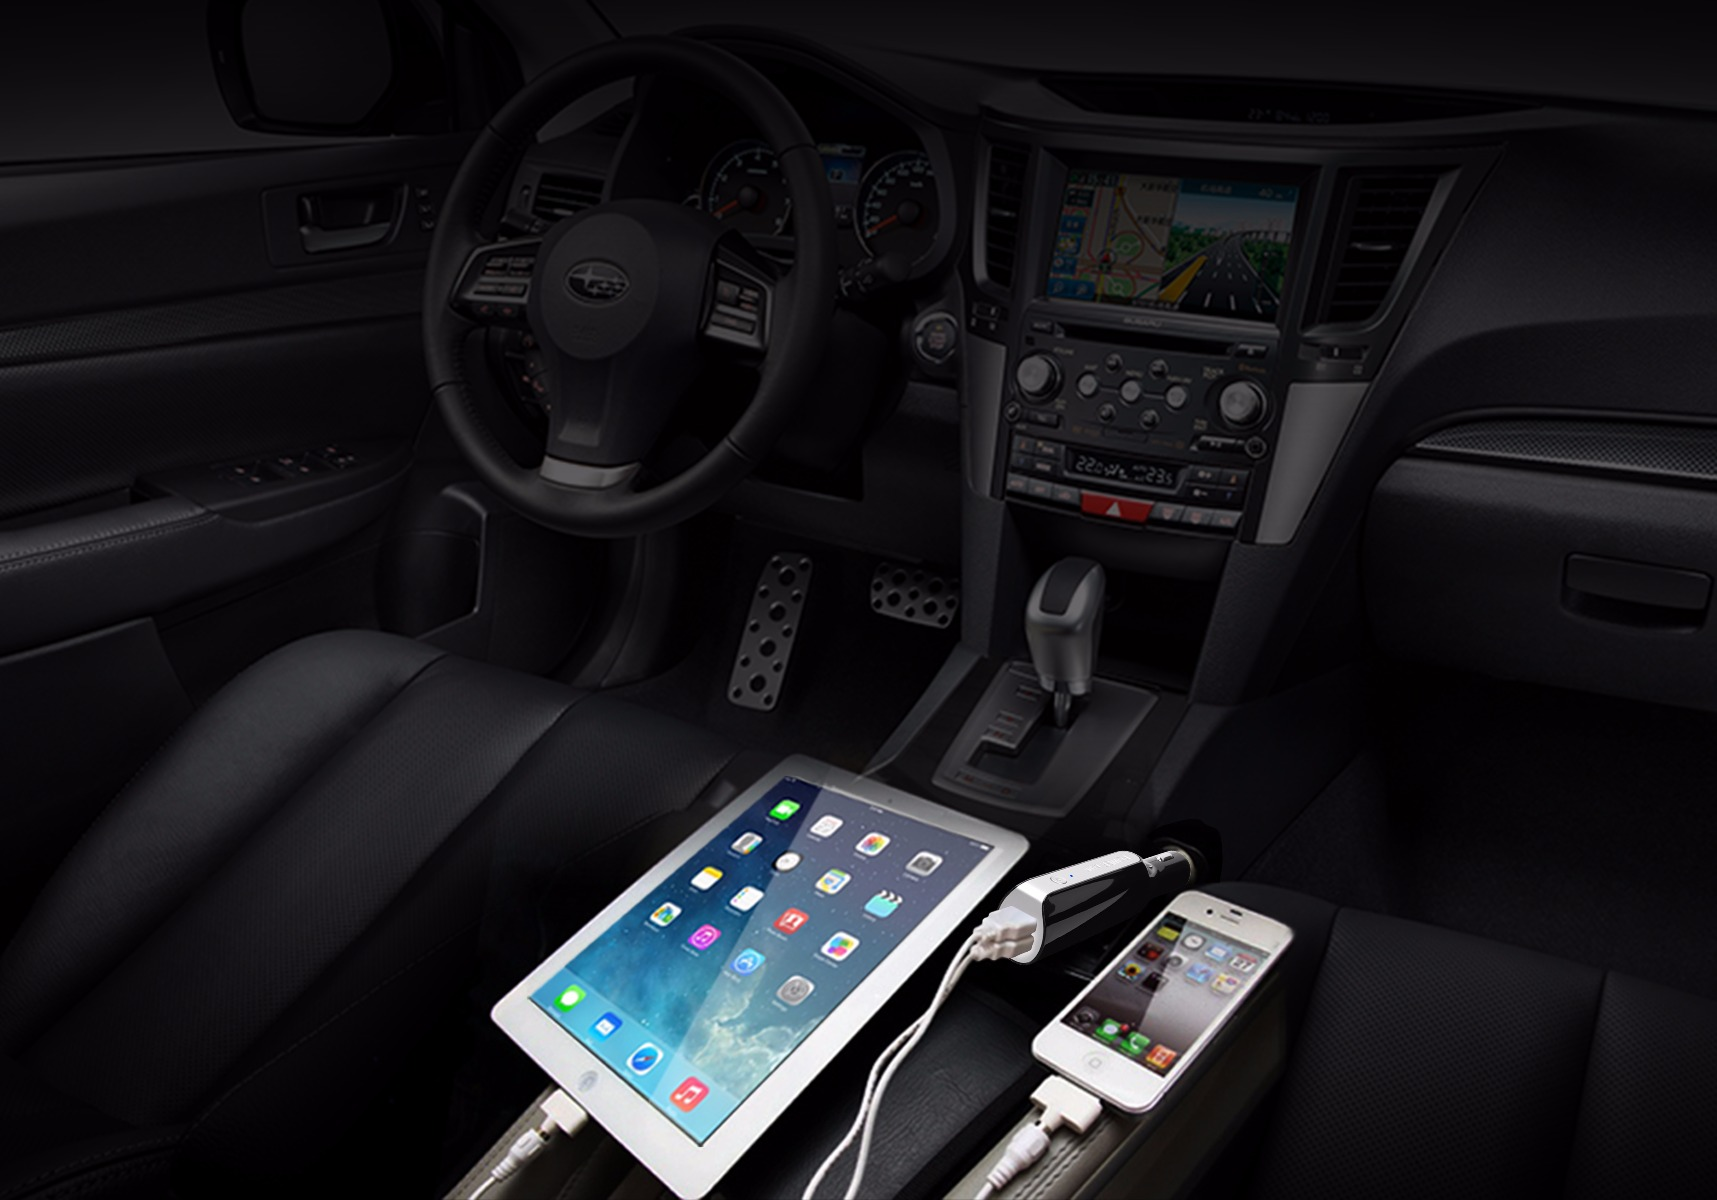 Seenda ICH-15C Car Charger 2800mAh Power Bank with 2 USB Port